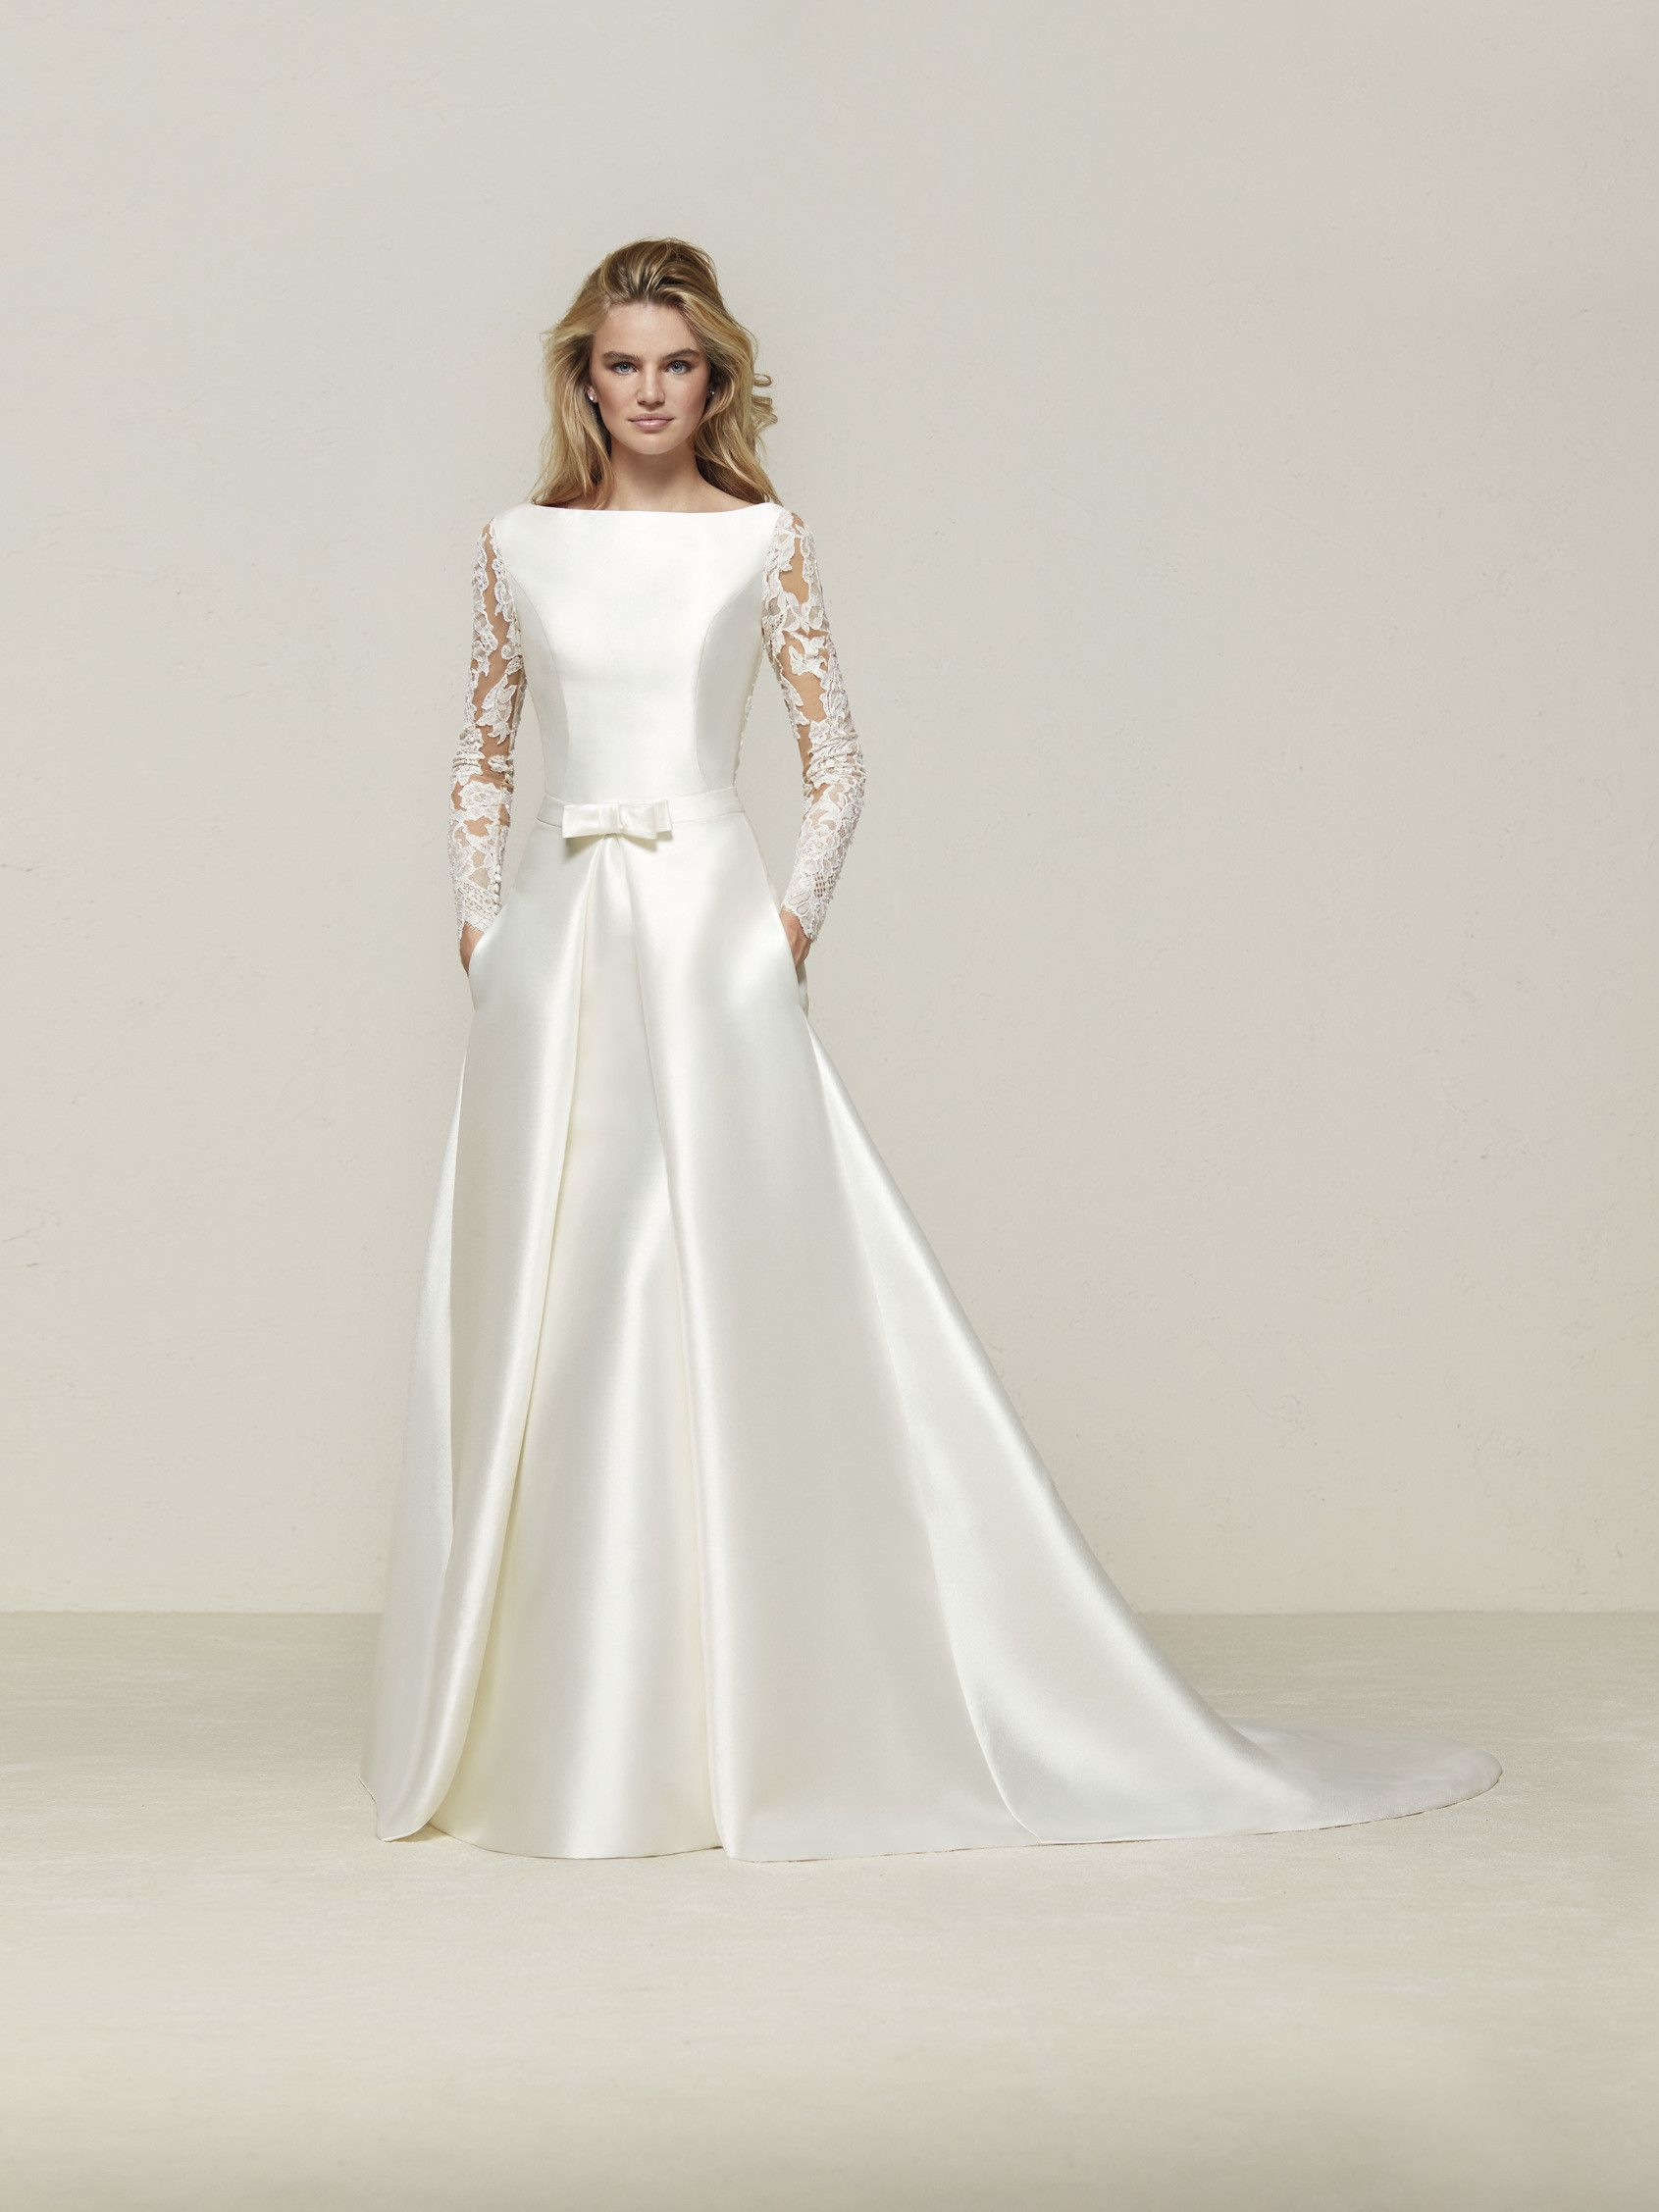 e0212dd6f0 Drales  Elegante vestido de novia de corte sirena en mikado con manga larga  y espalda de efecto tatuaje - Pronovias